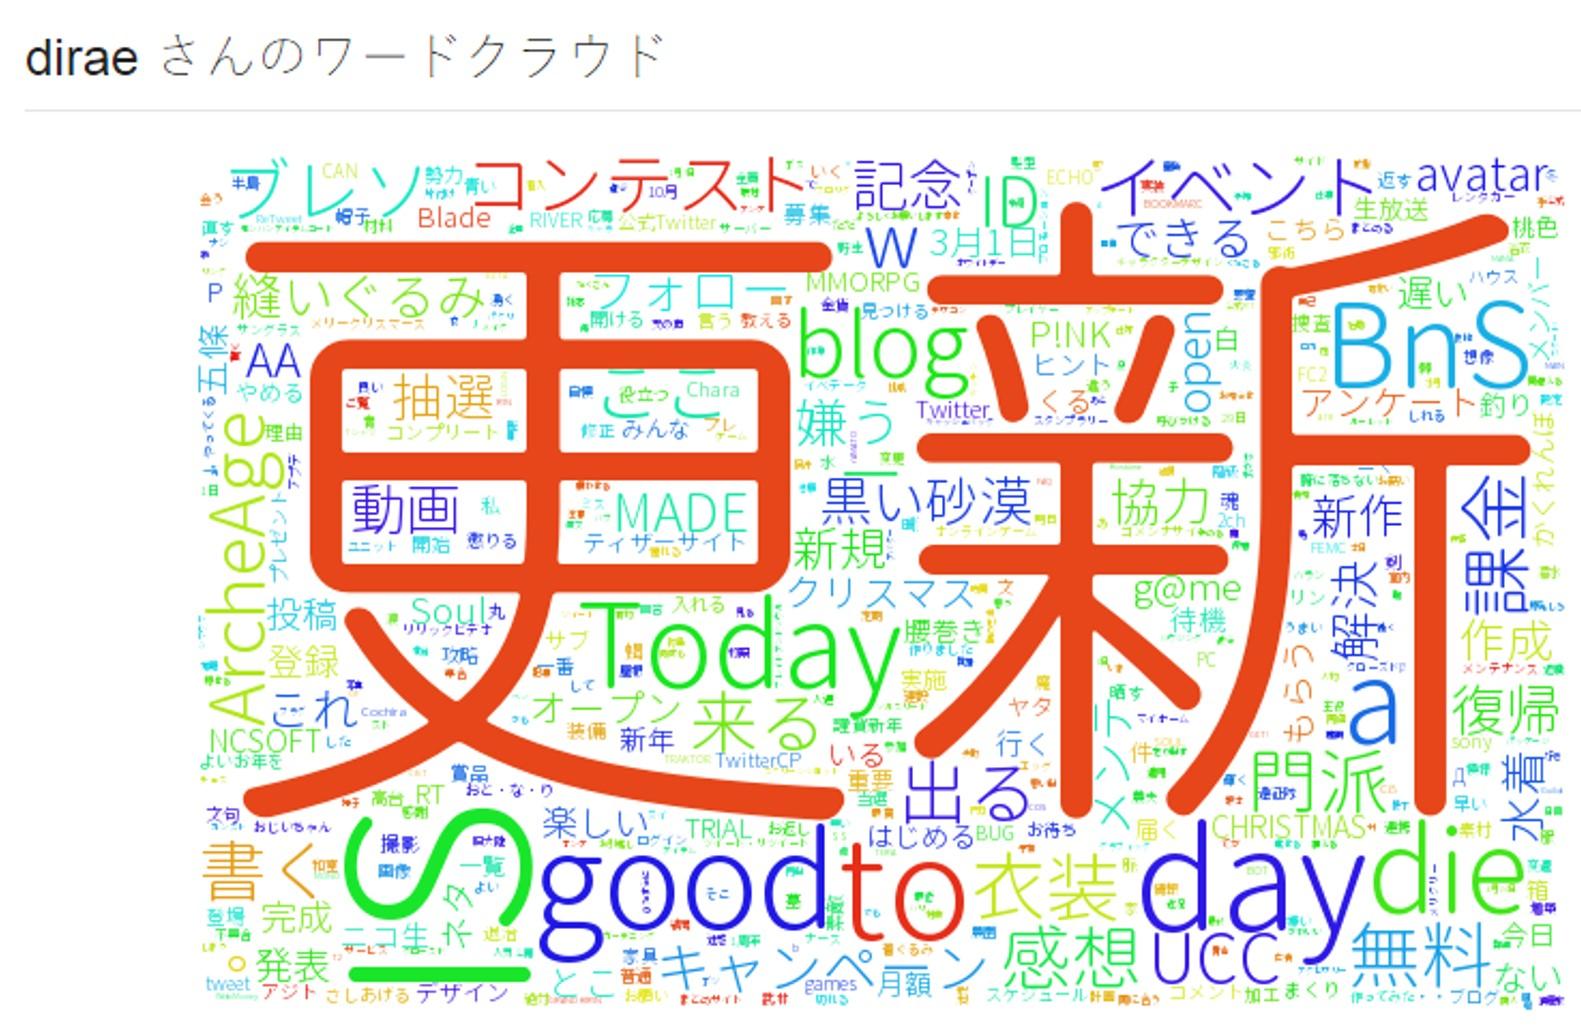 20151101094914a3f.jpg